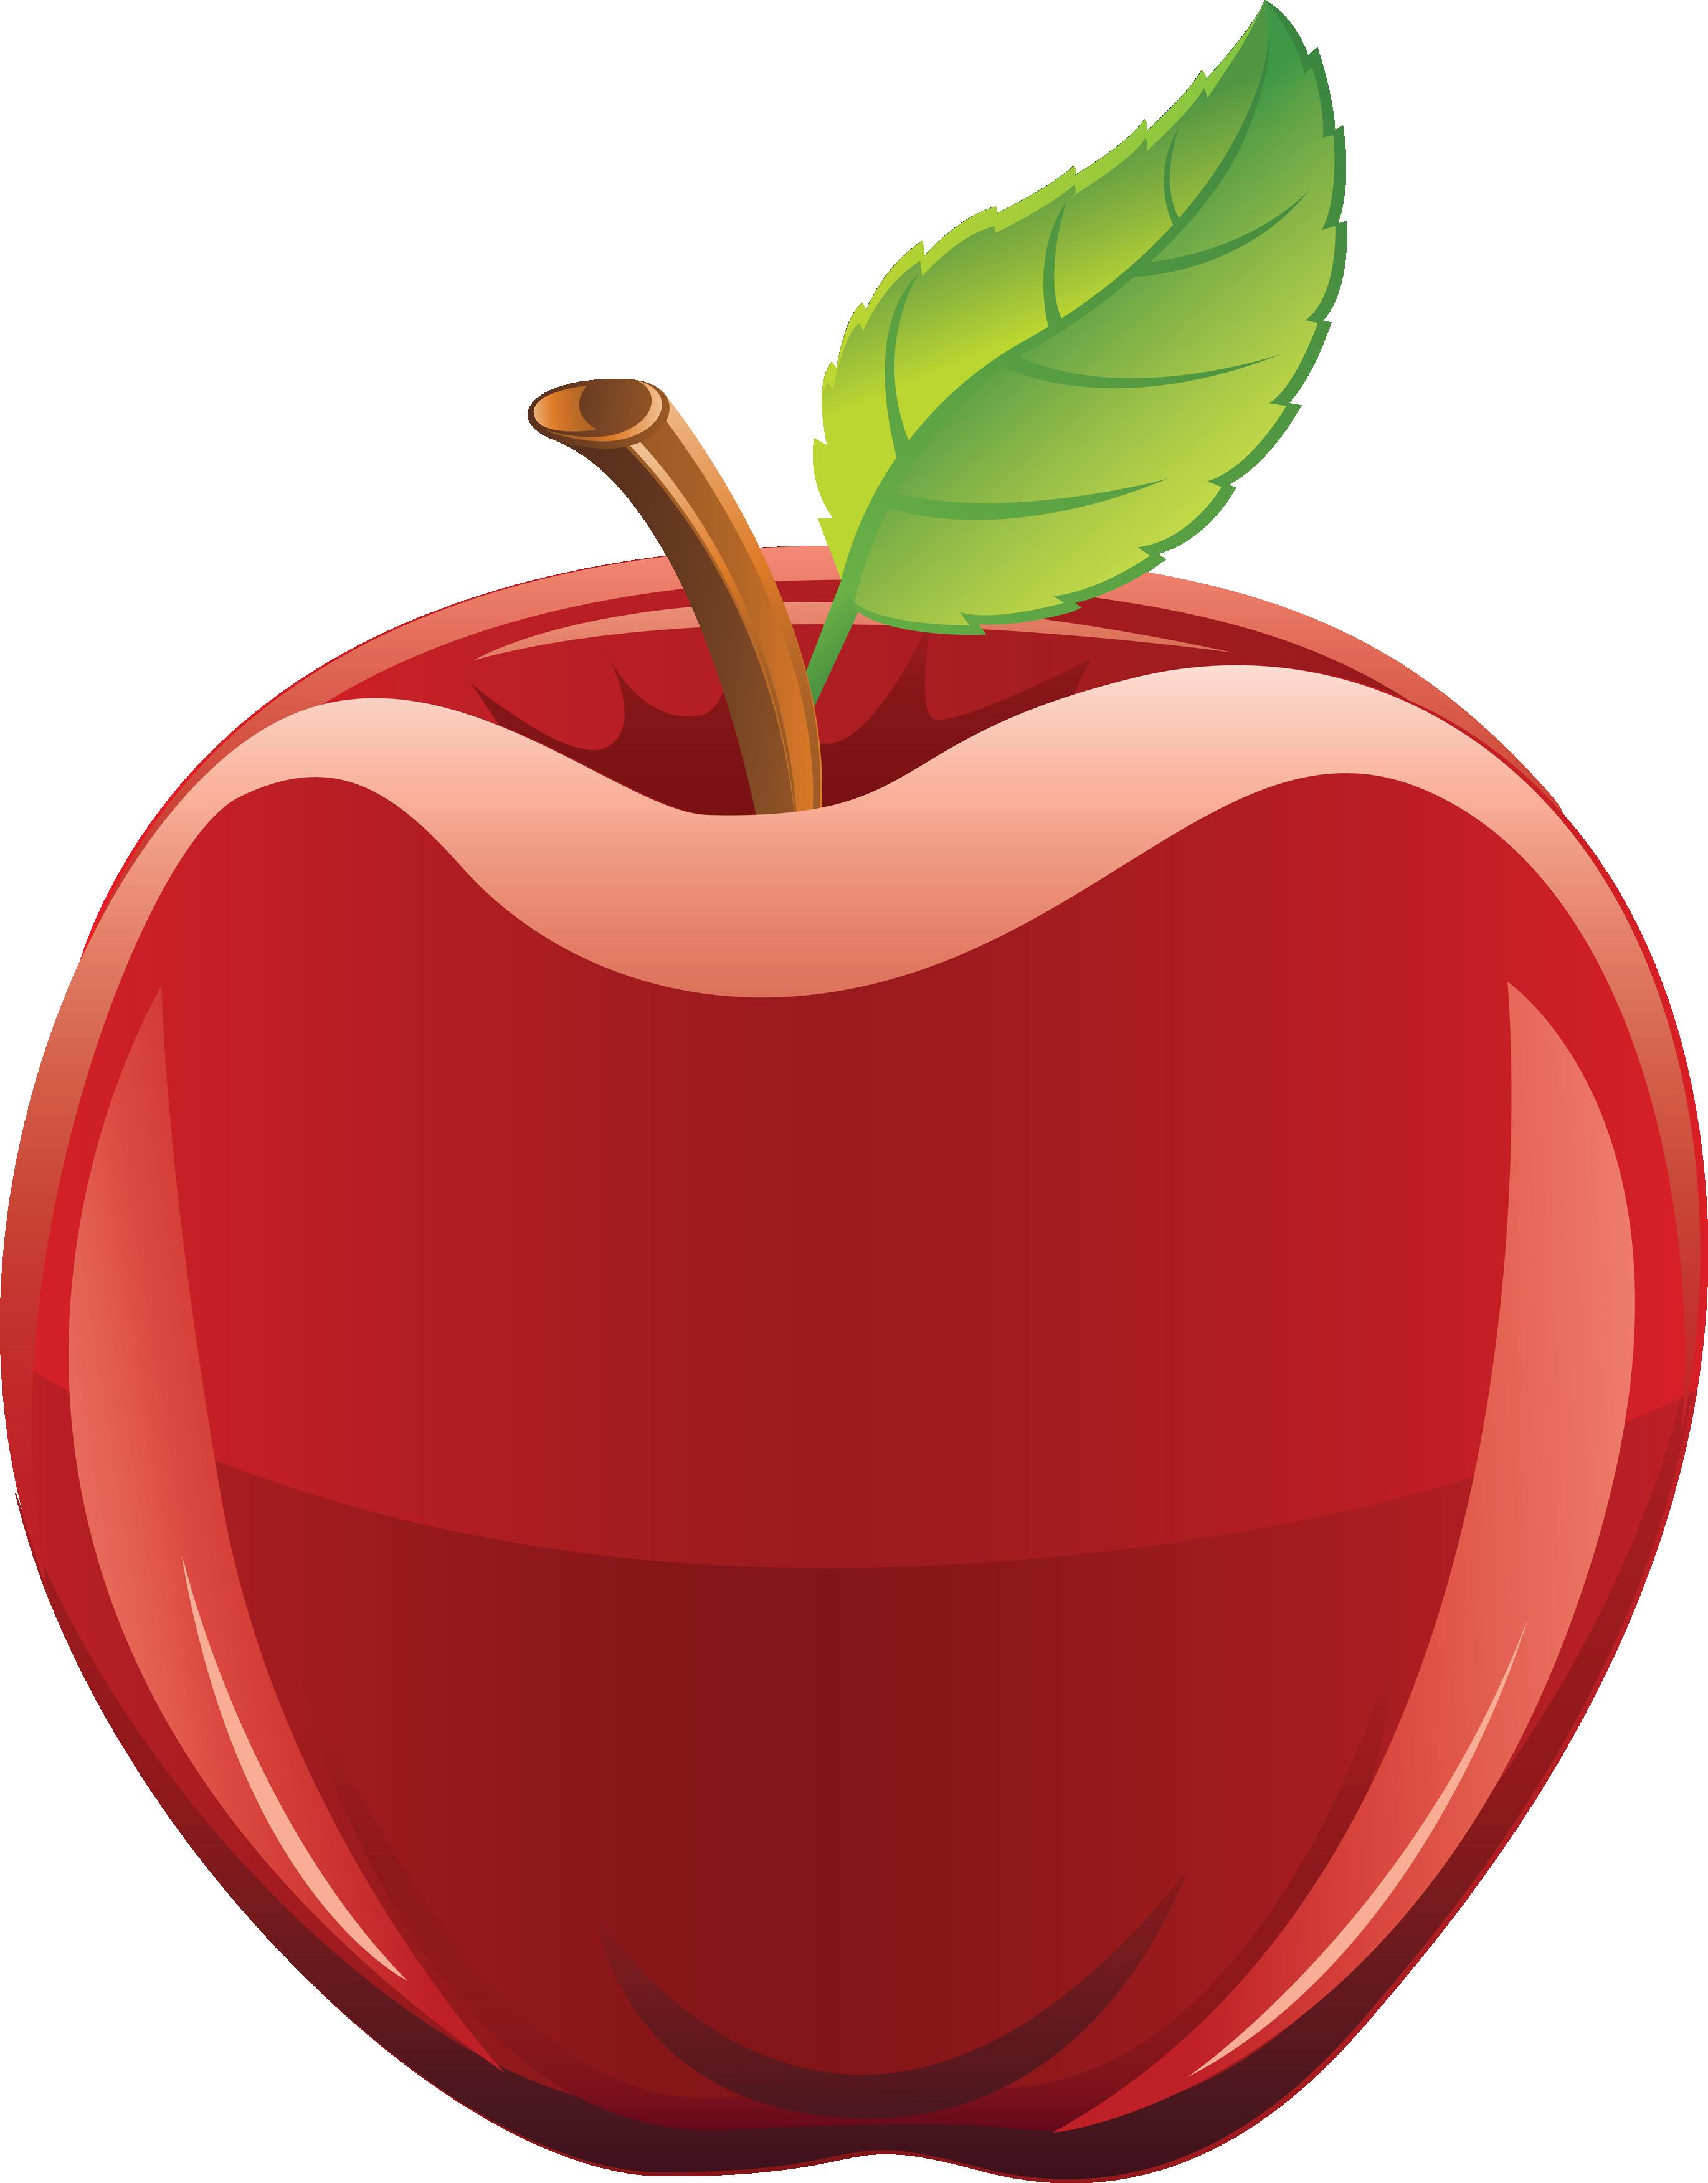 2742x3504 Cute Apple Clip Art Free Clipart Images 2 6